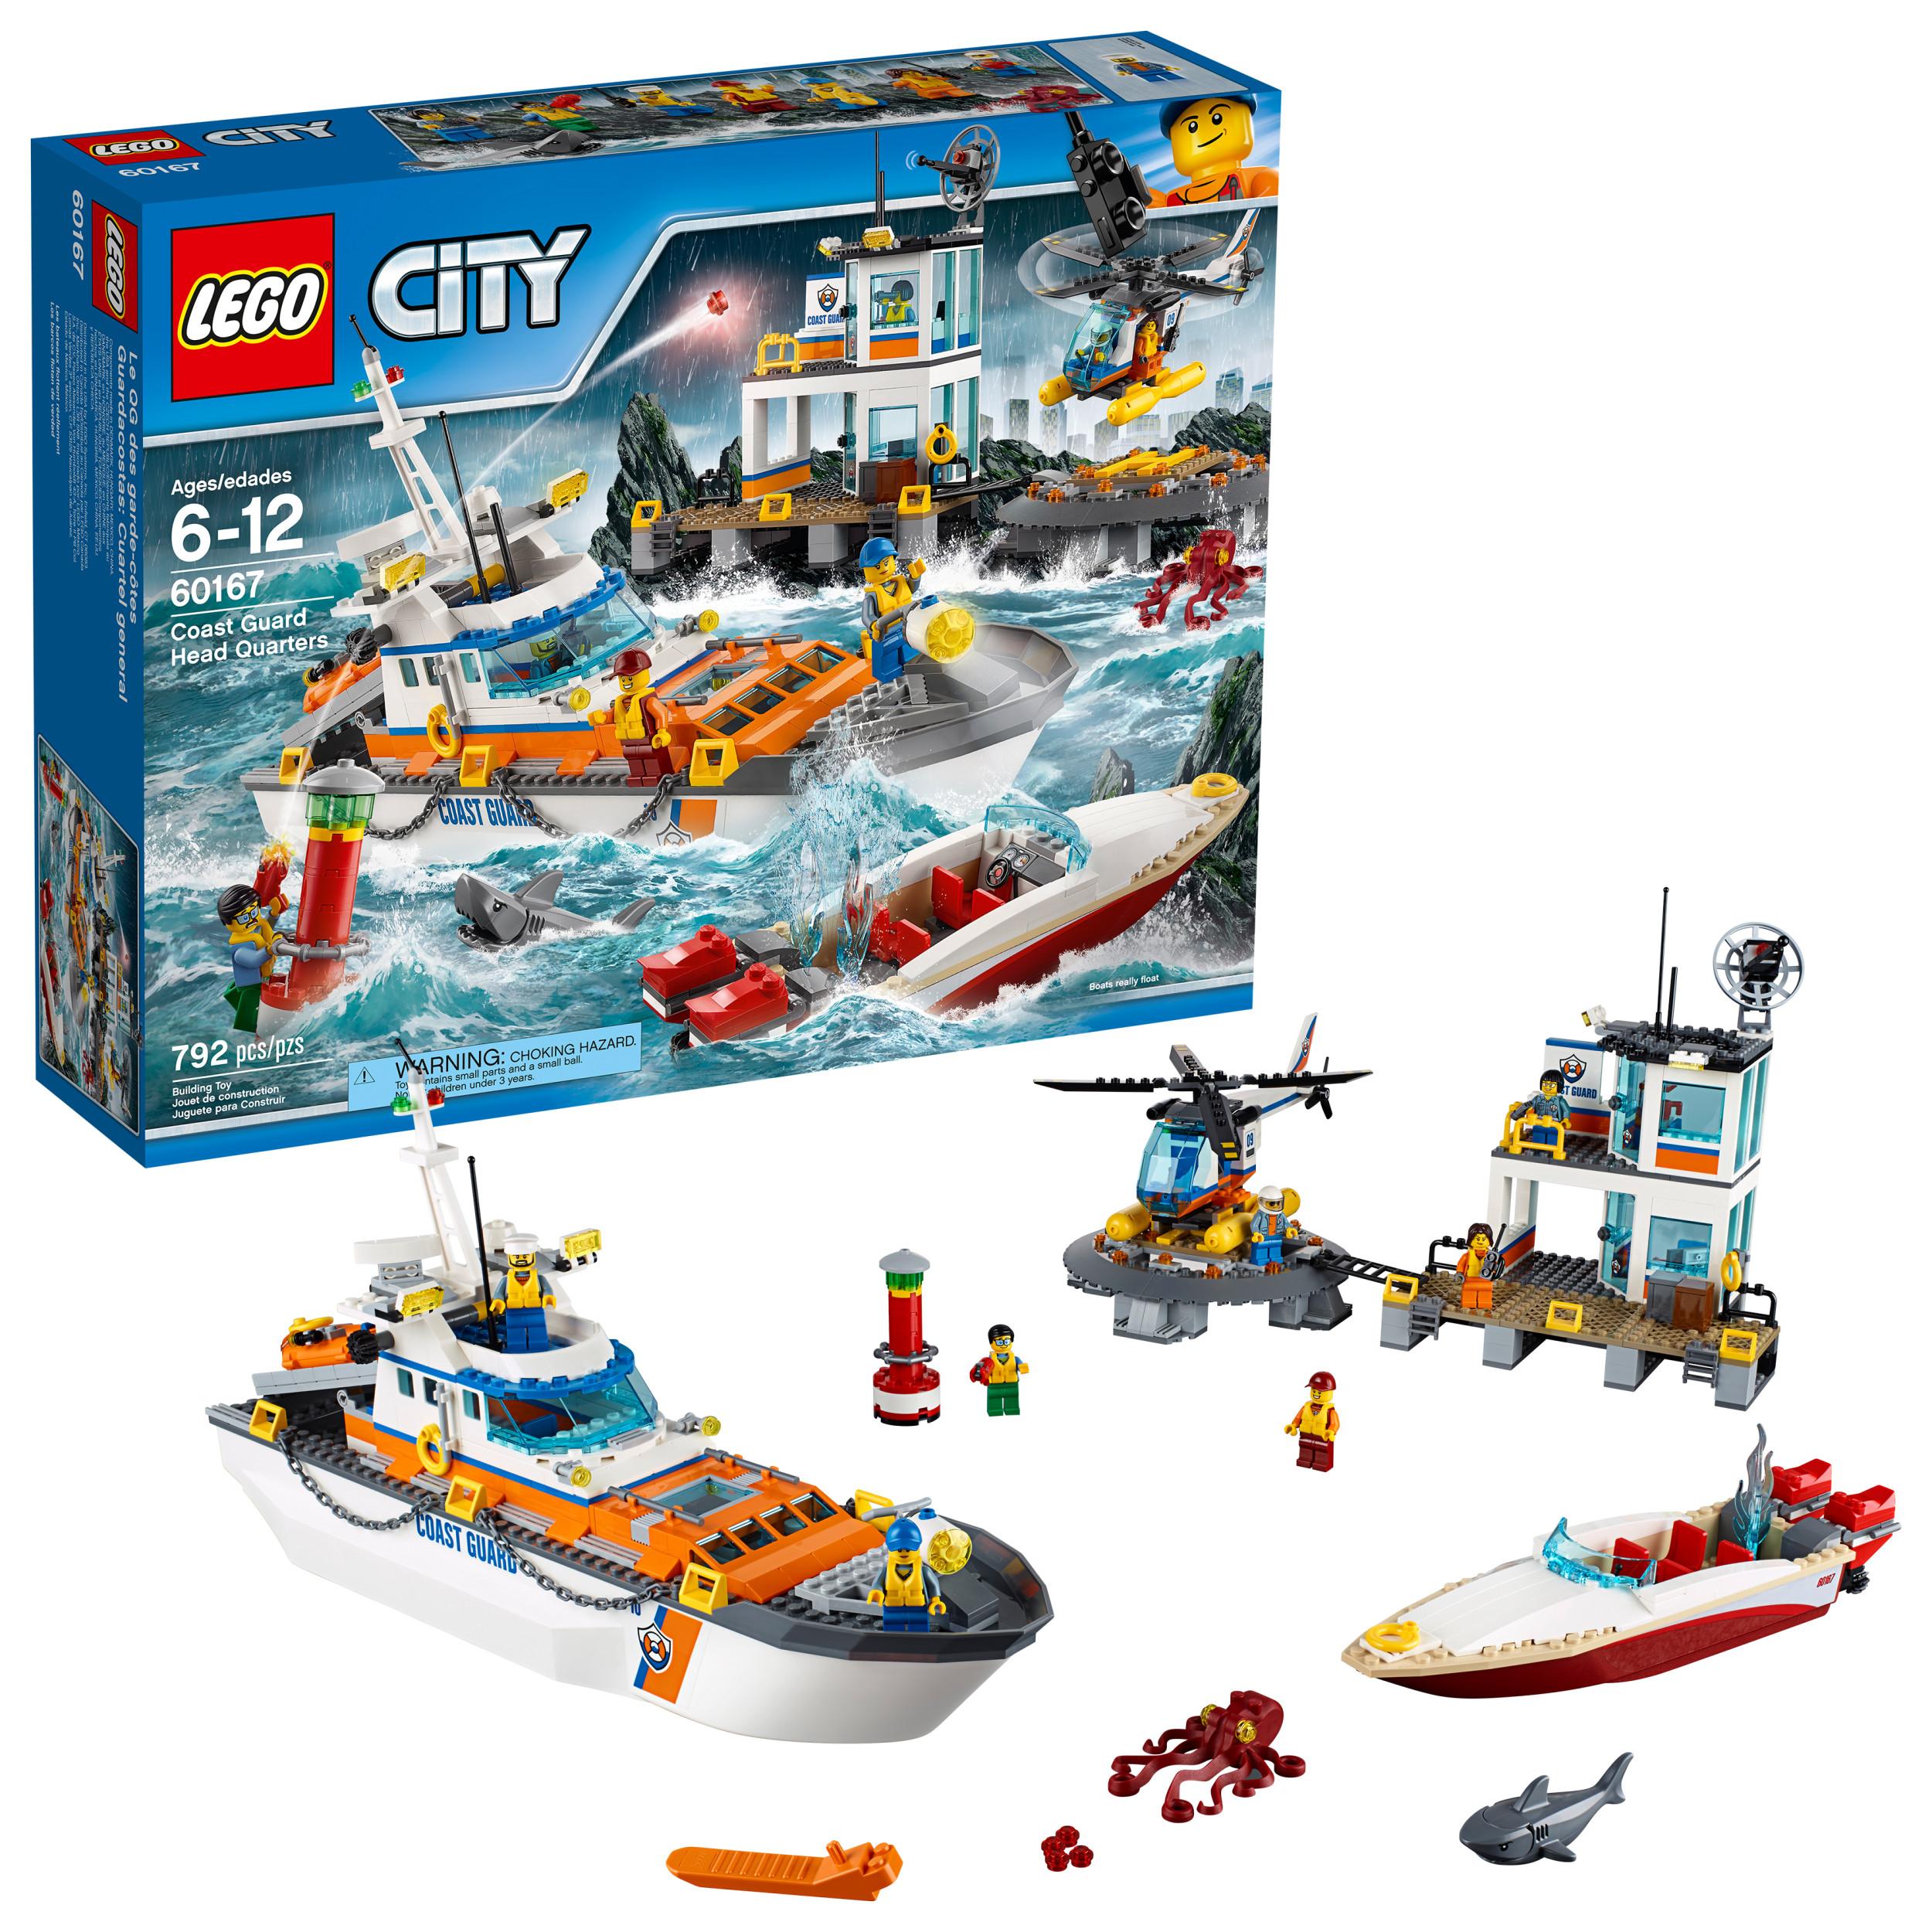 LEGO City Coast Guard Coast Guard Head Quarters 60167